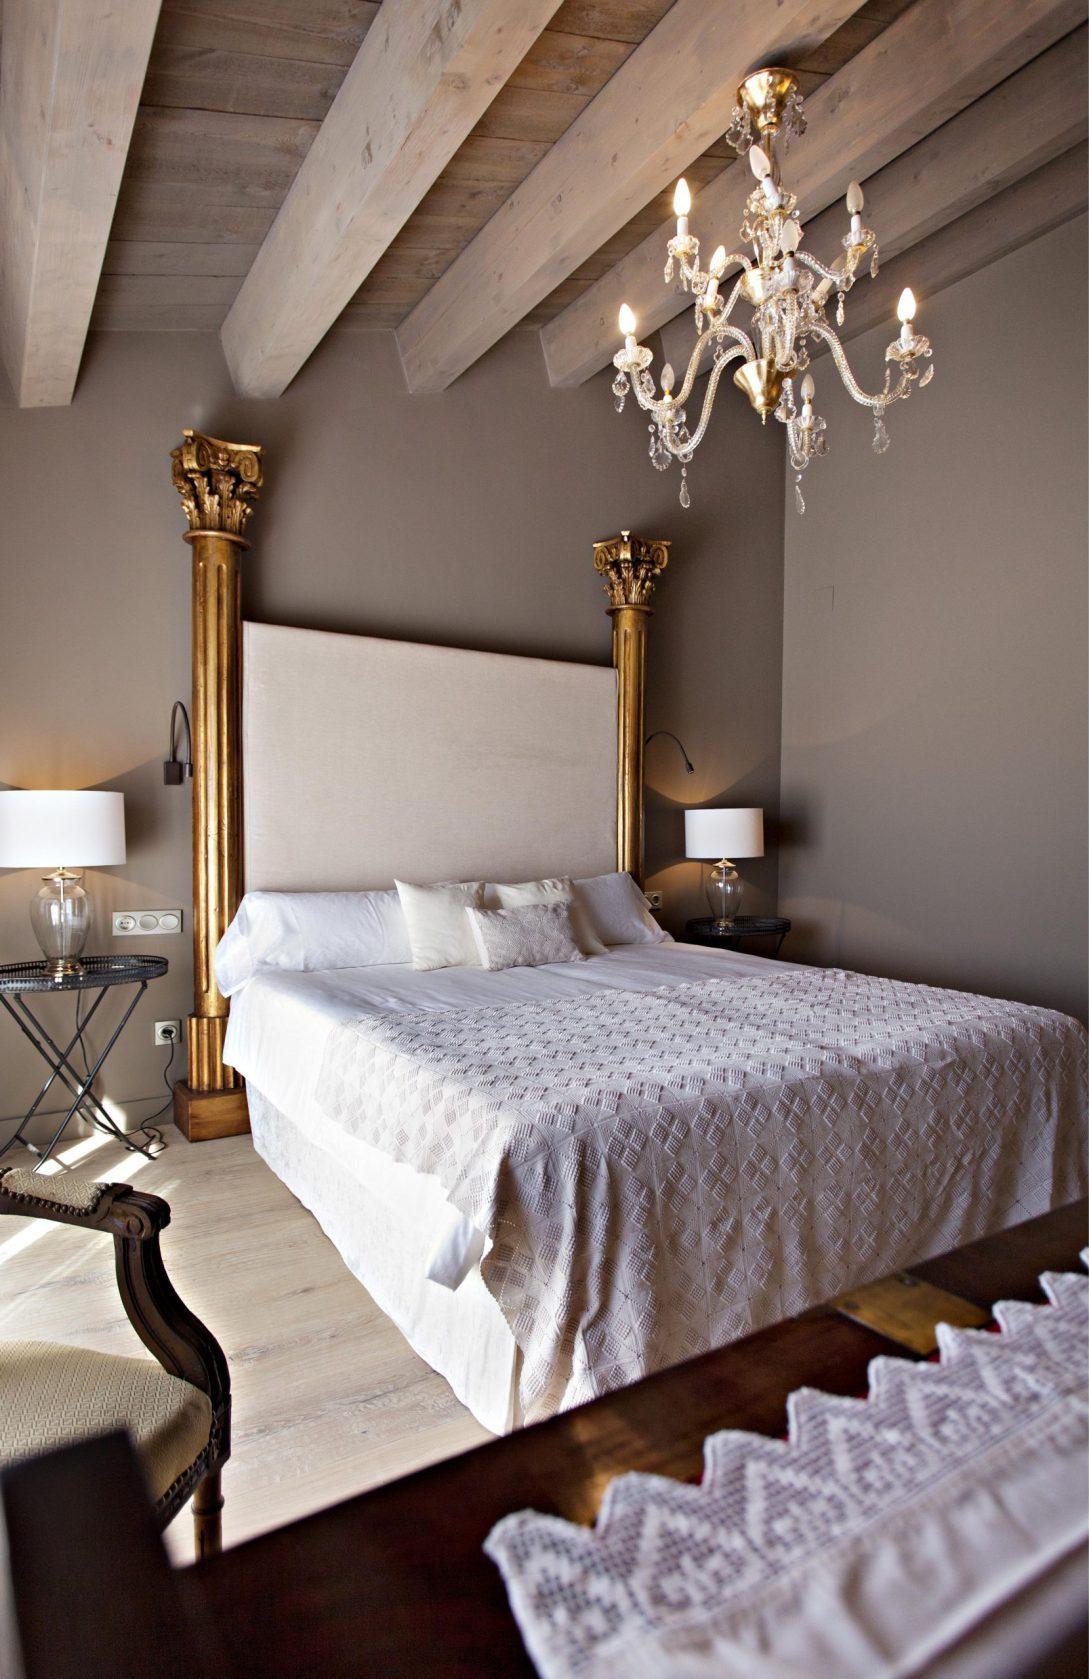 escultural cama